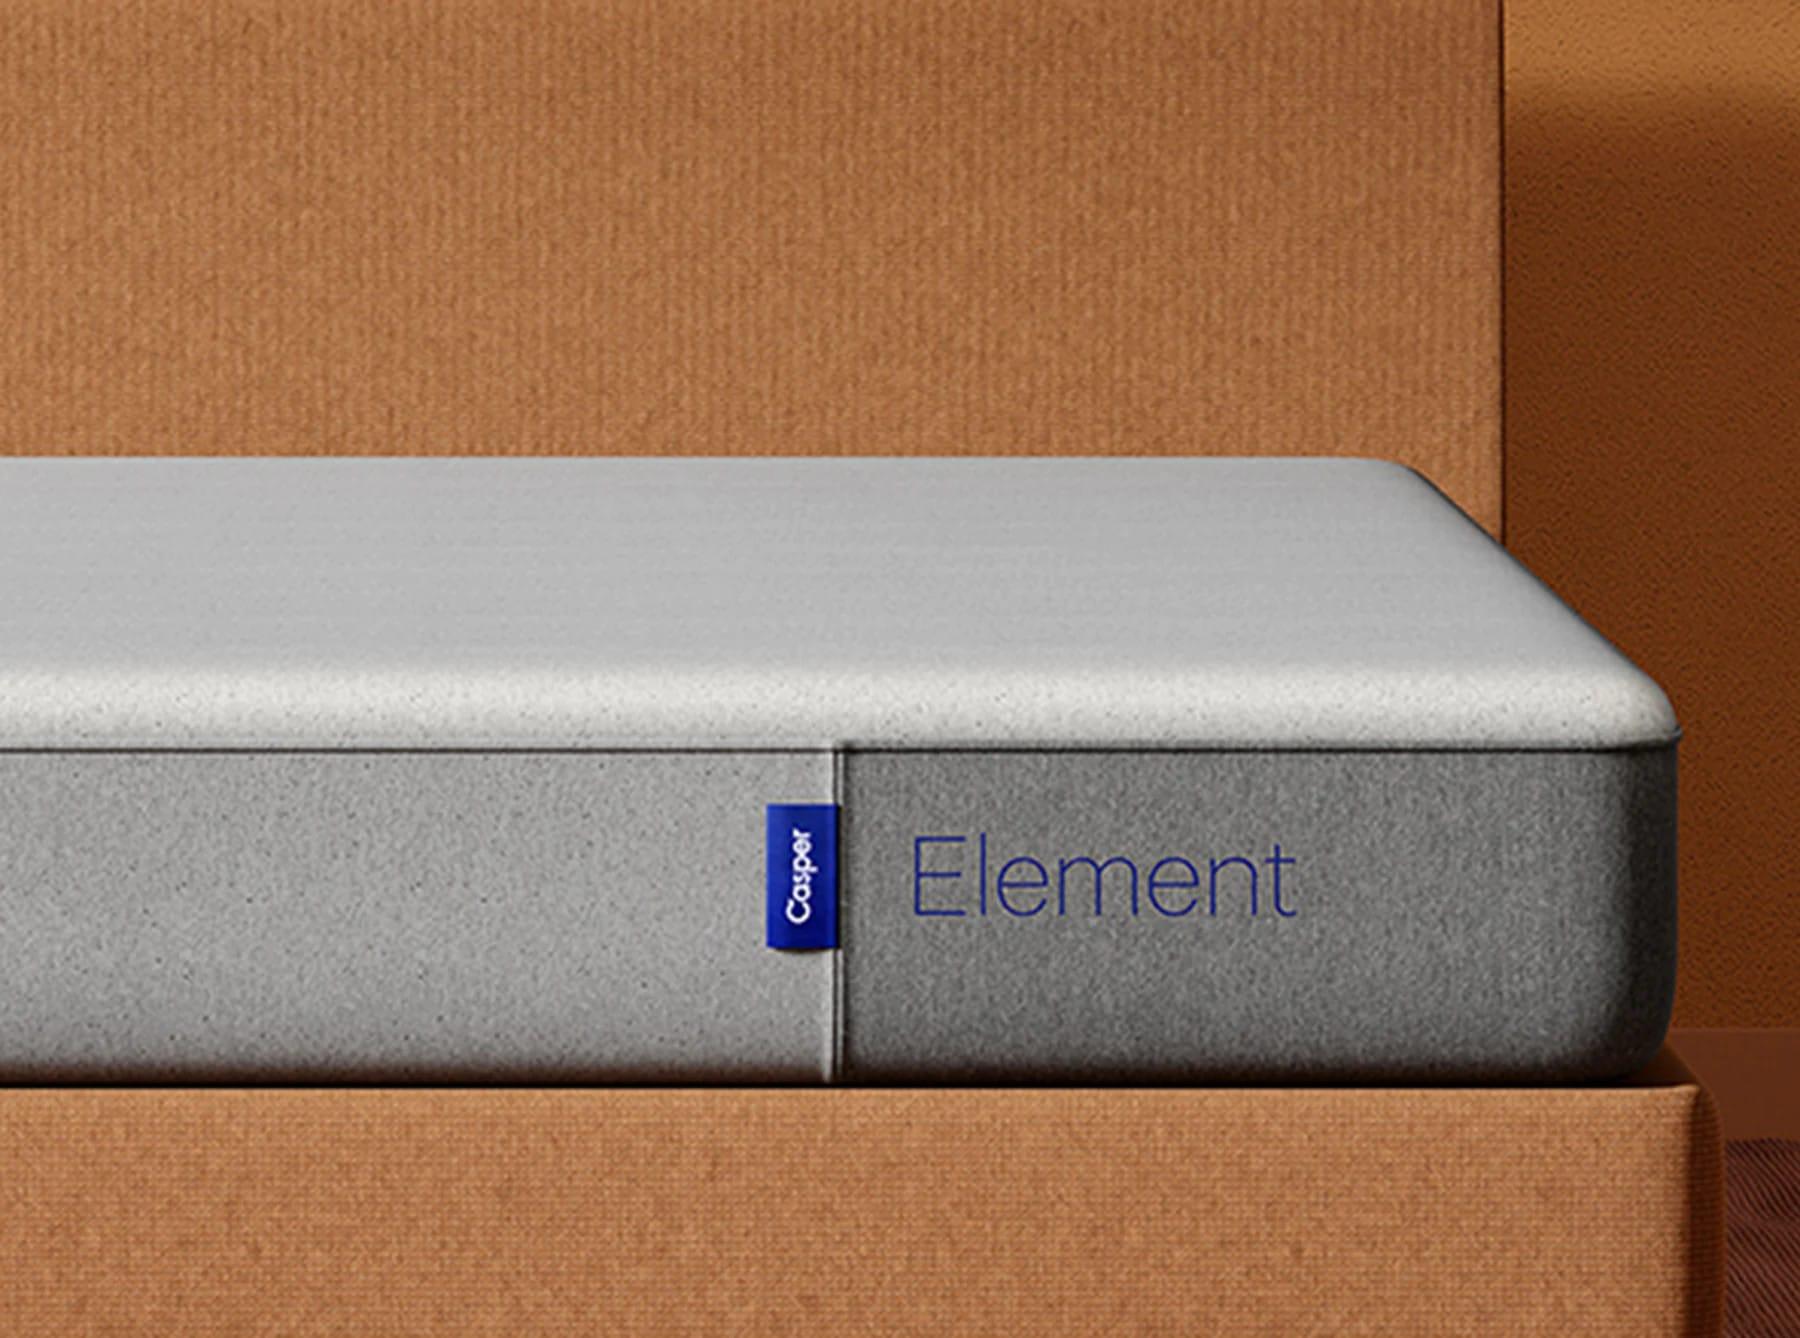 element mattress by casper compared